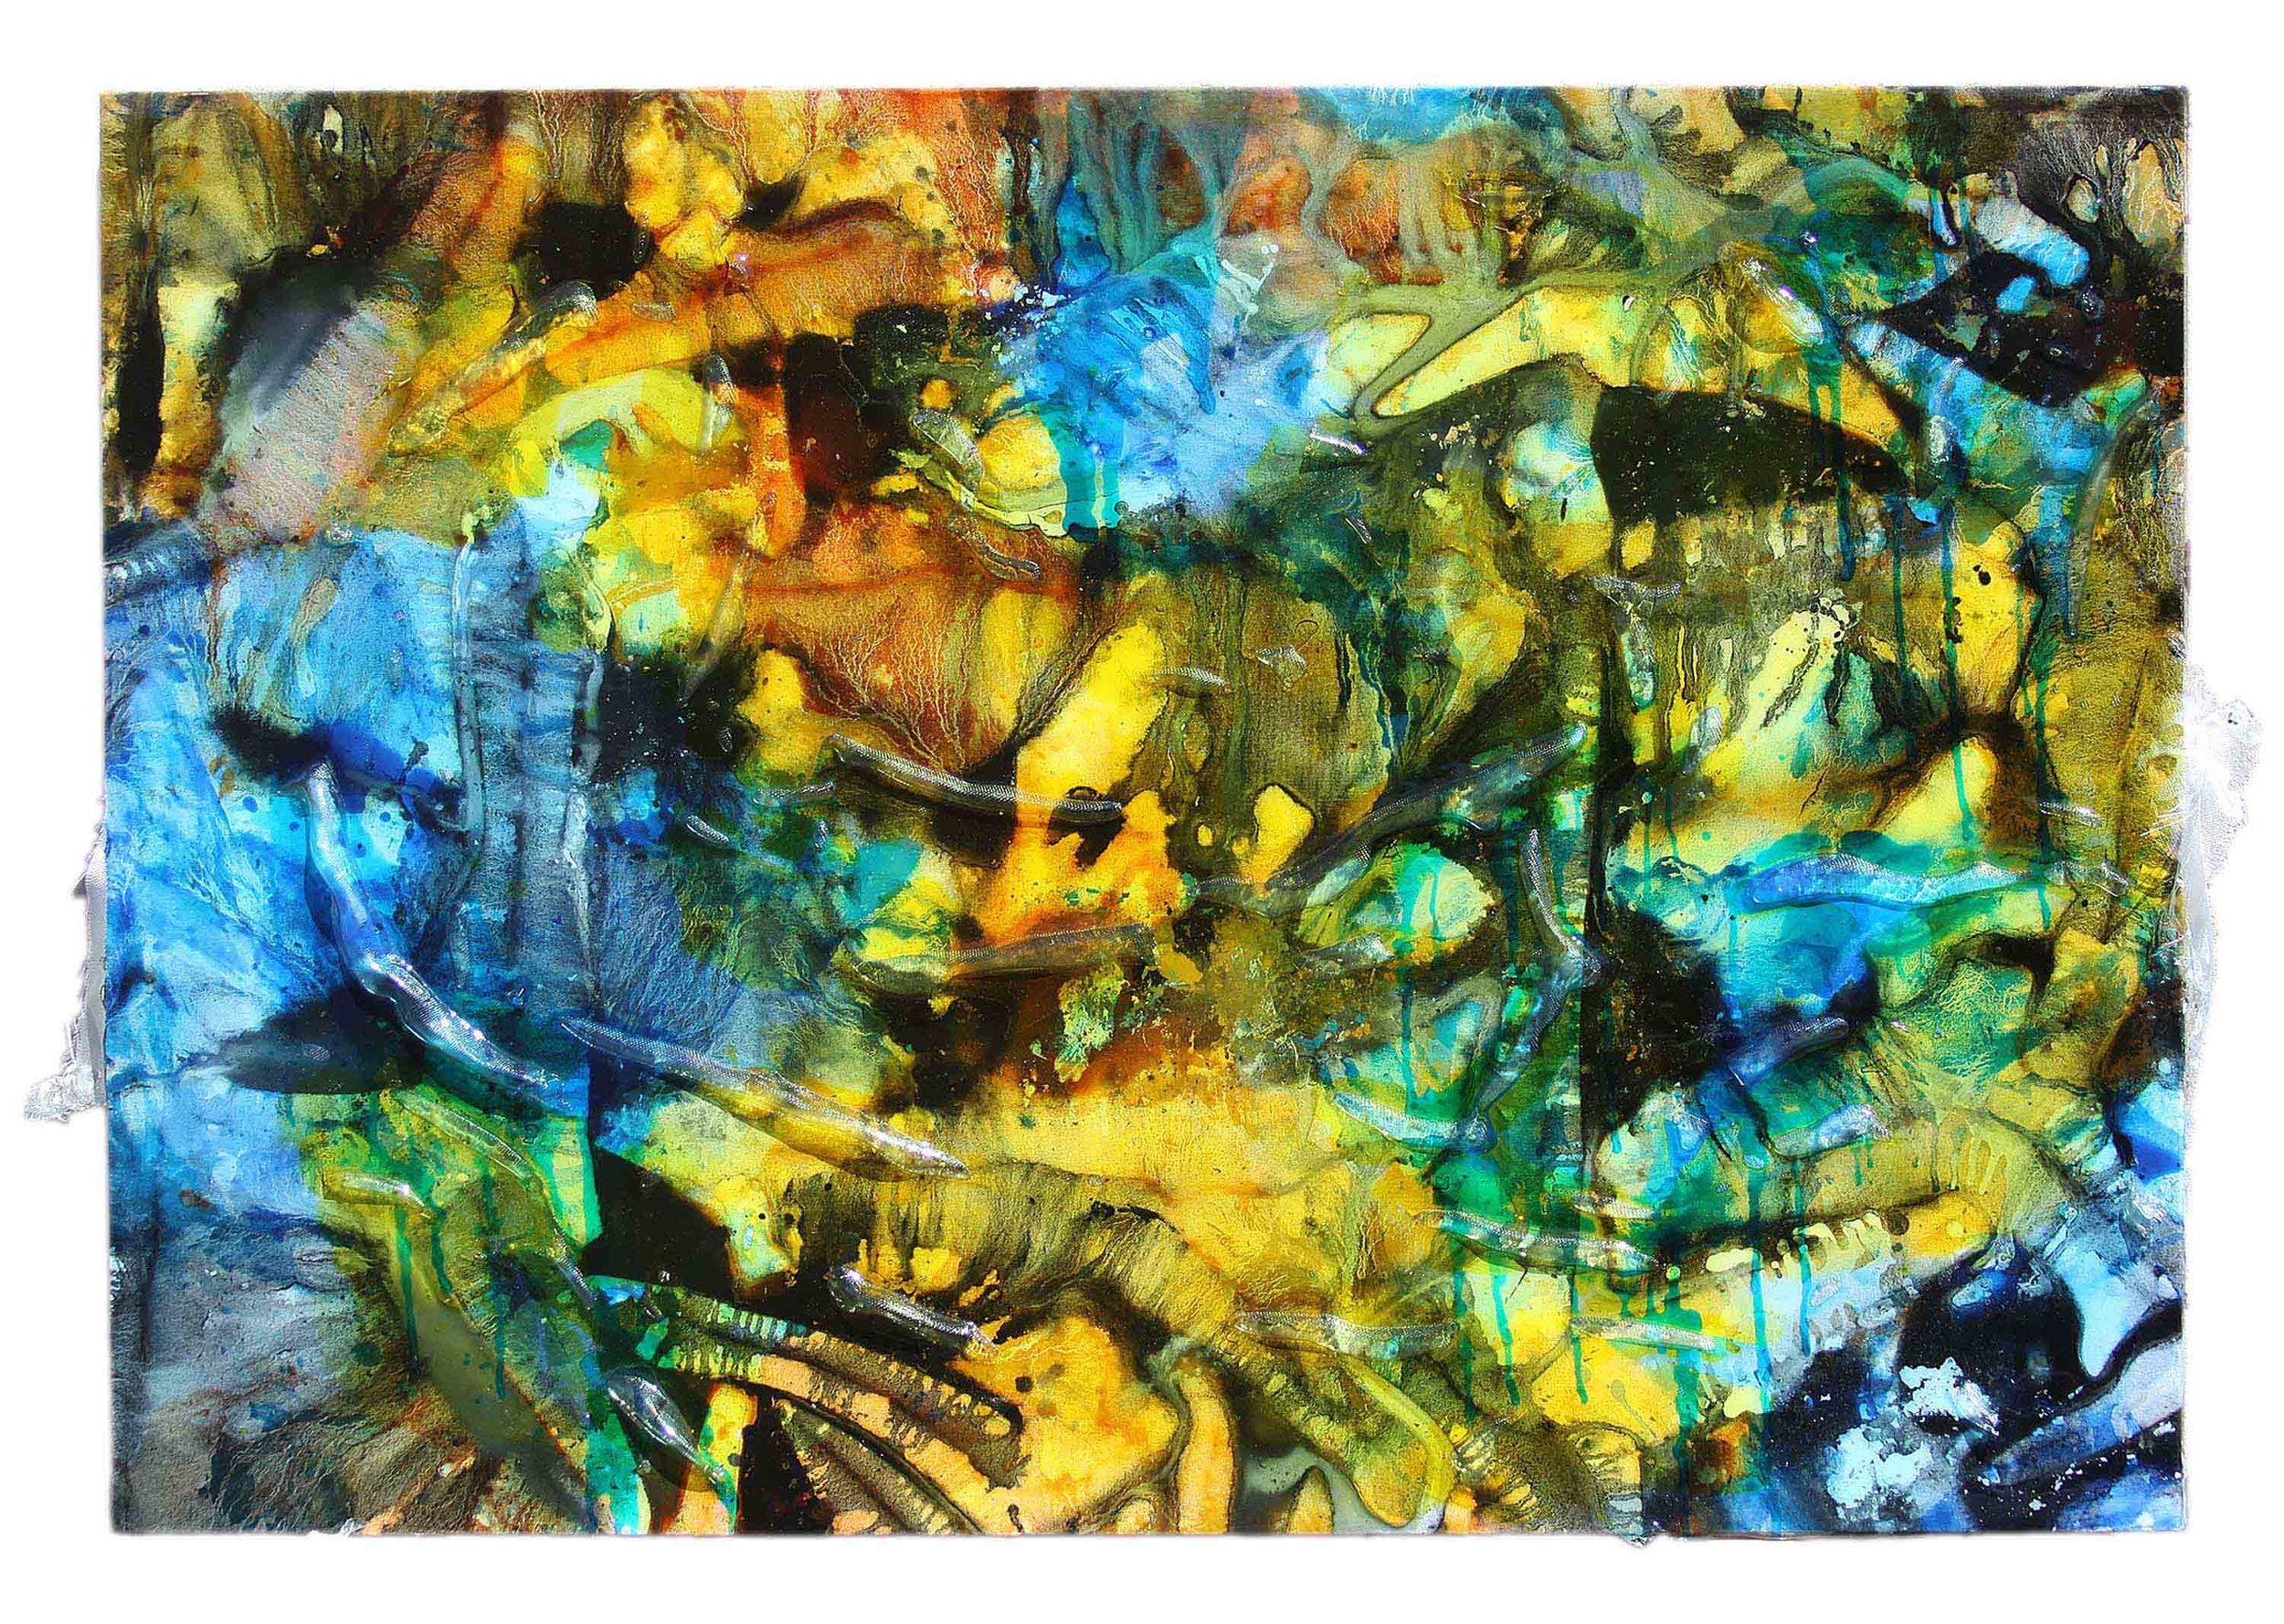 Tidepools Herbie Fletcher Resin Painting IMG_5901-C-S-LR.jpg